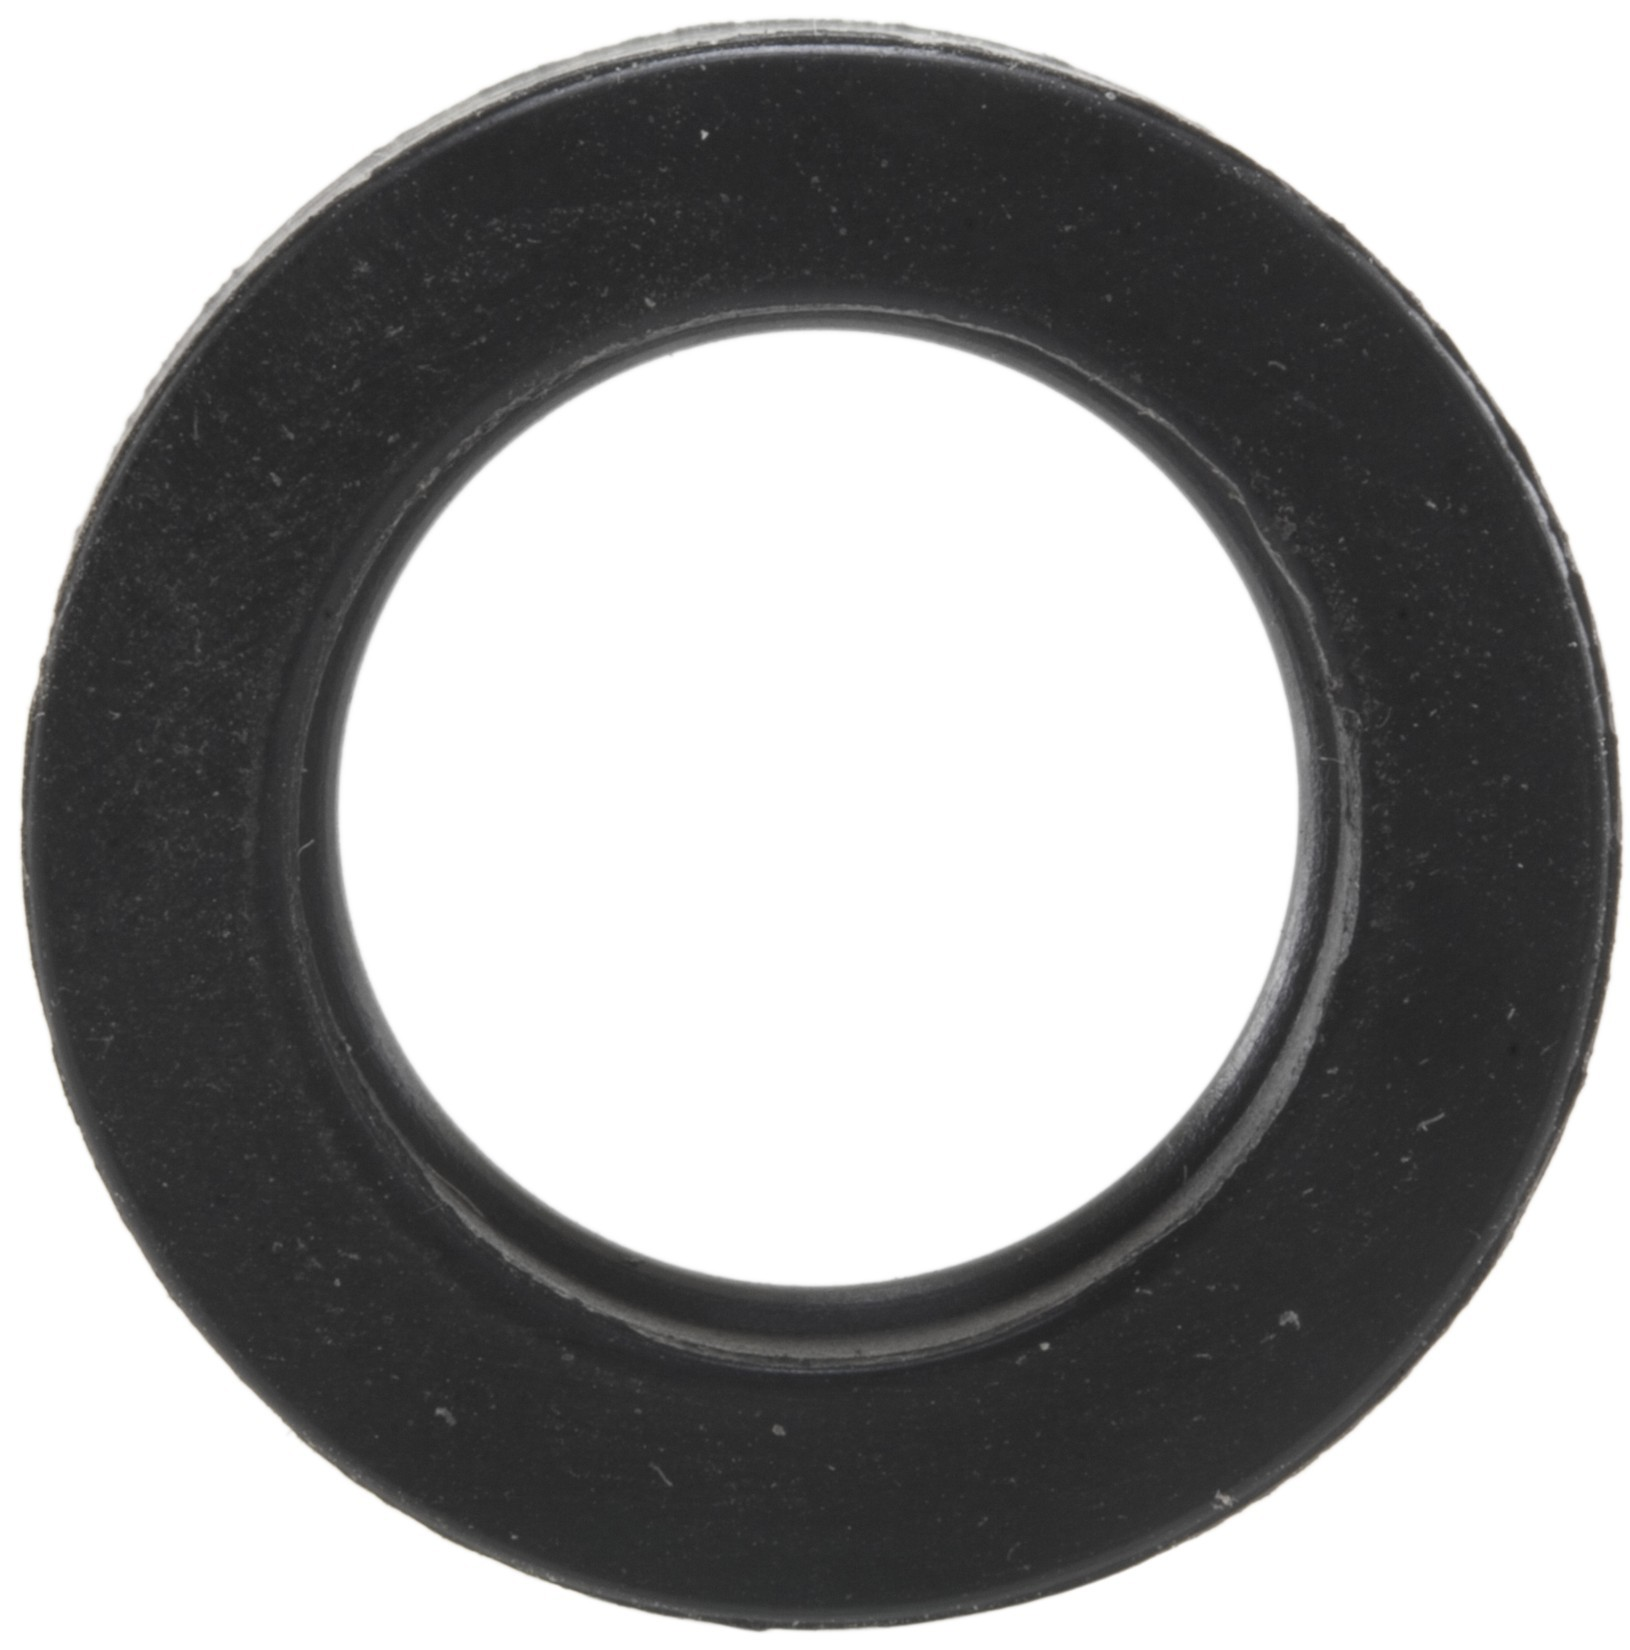 AIRTEX ENG. MGMT. SYSTEMS - Injector Seal Kit - AEM 1G1010